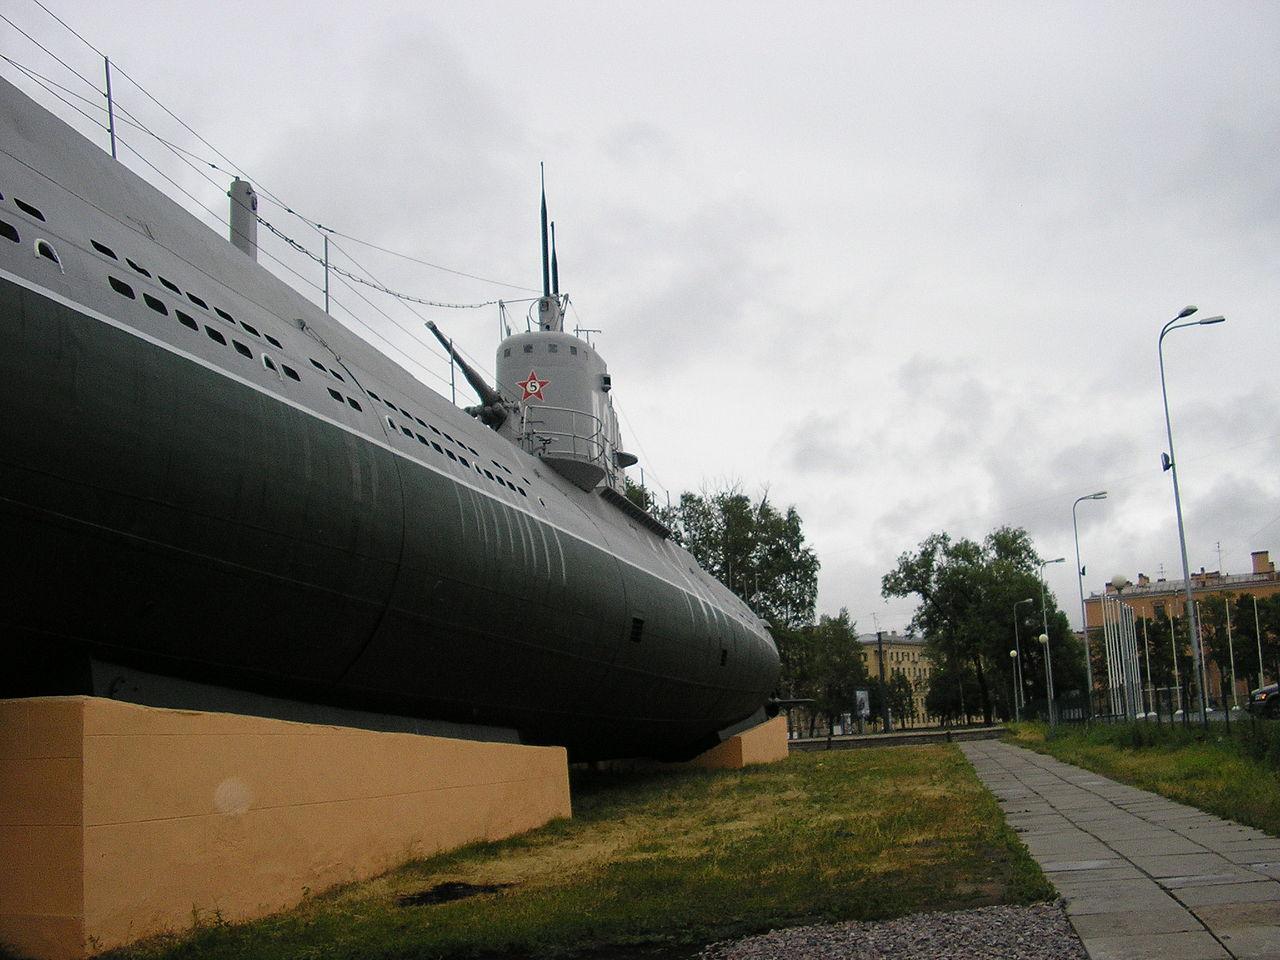 "Фотография музейной подводной лодки Д-2 ""Народоволец"" типа Декабрист. Автор фото: Цимбалистый Дмитрий Петрович (Wikimedia Commons)"